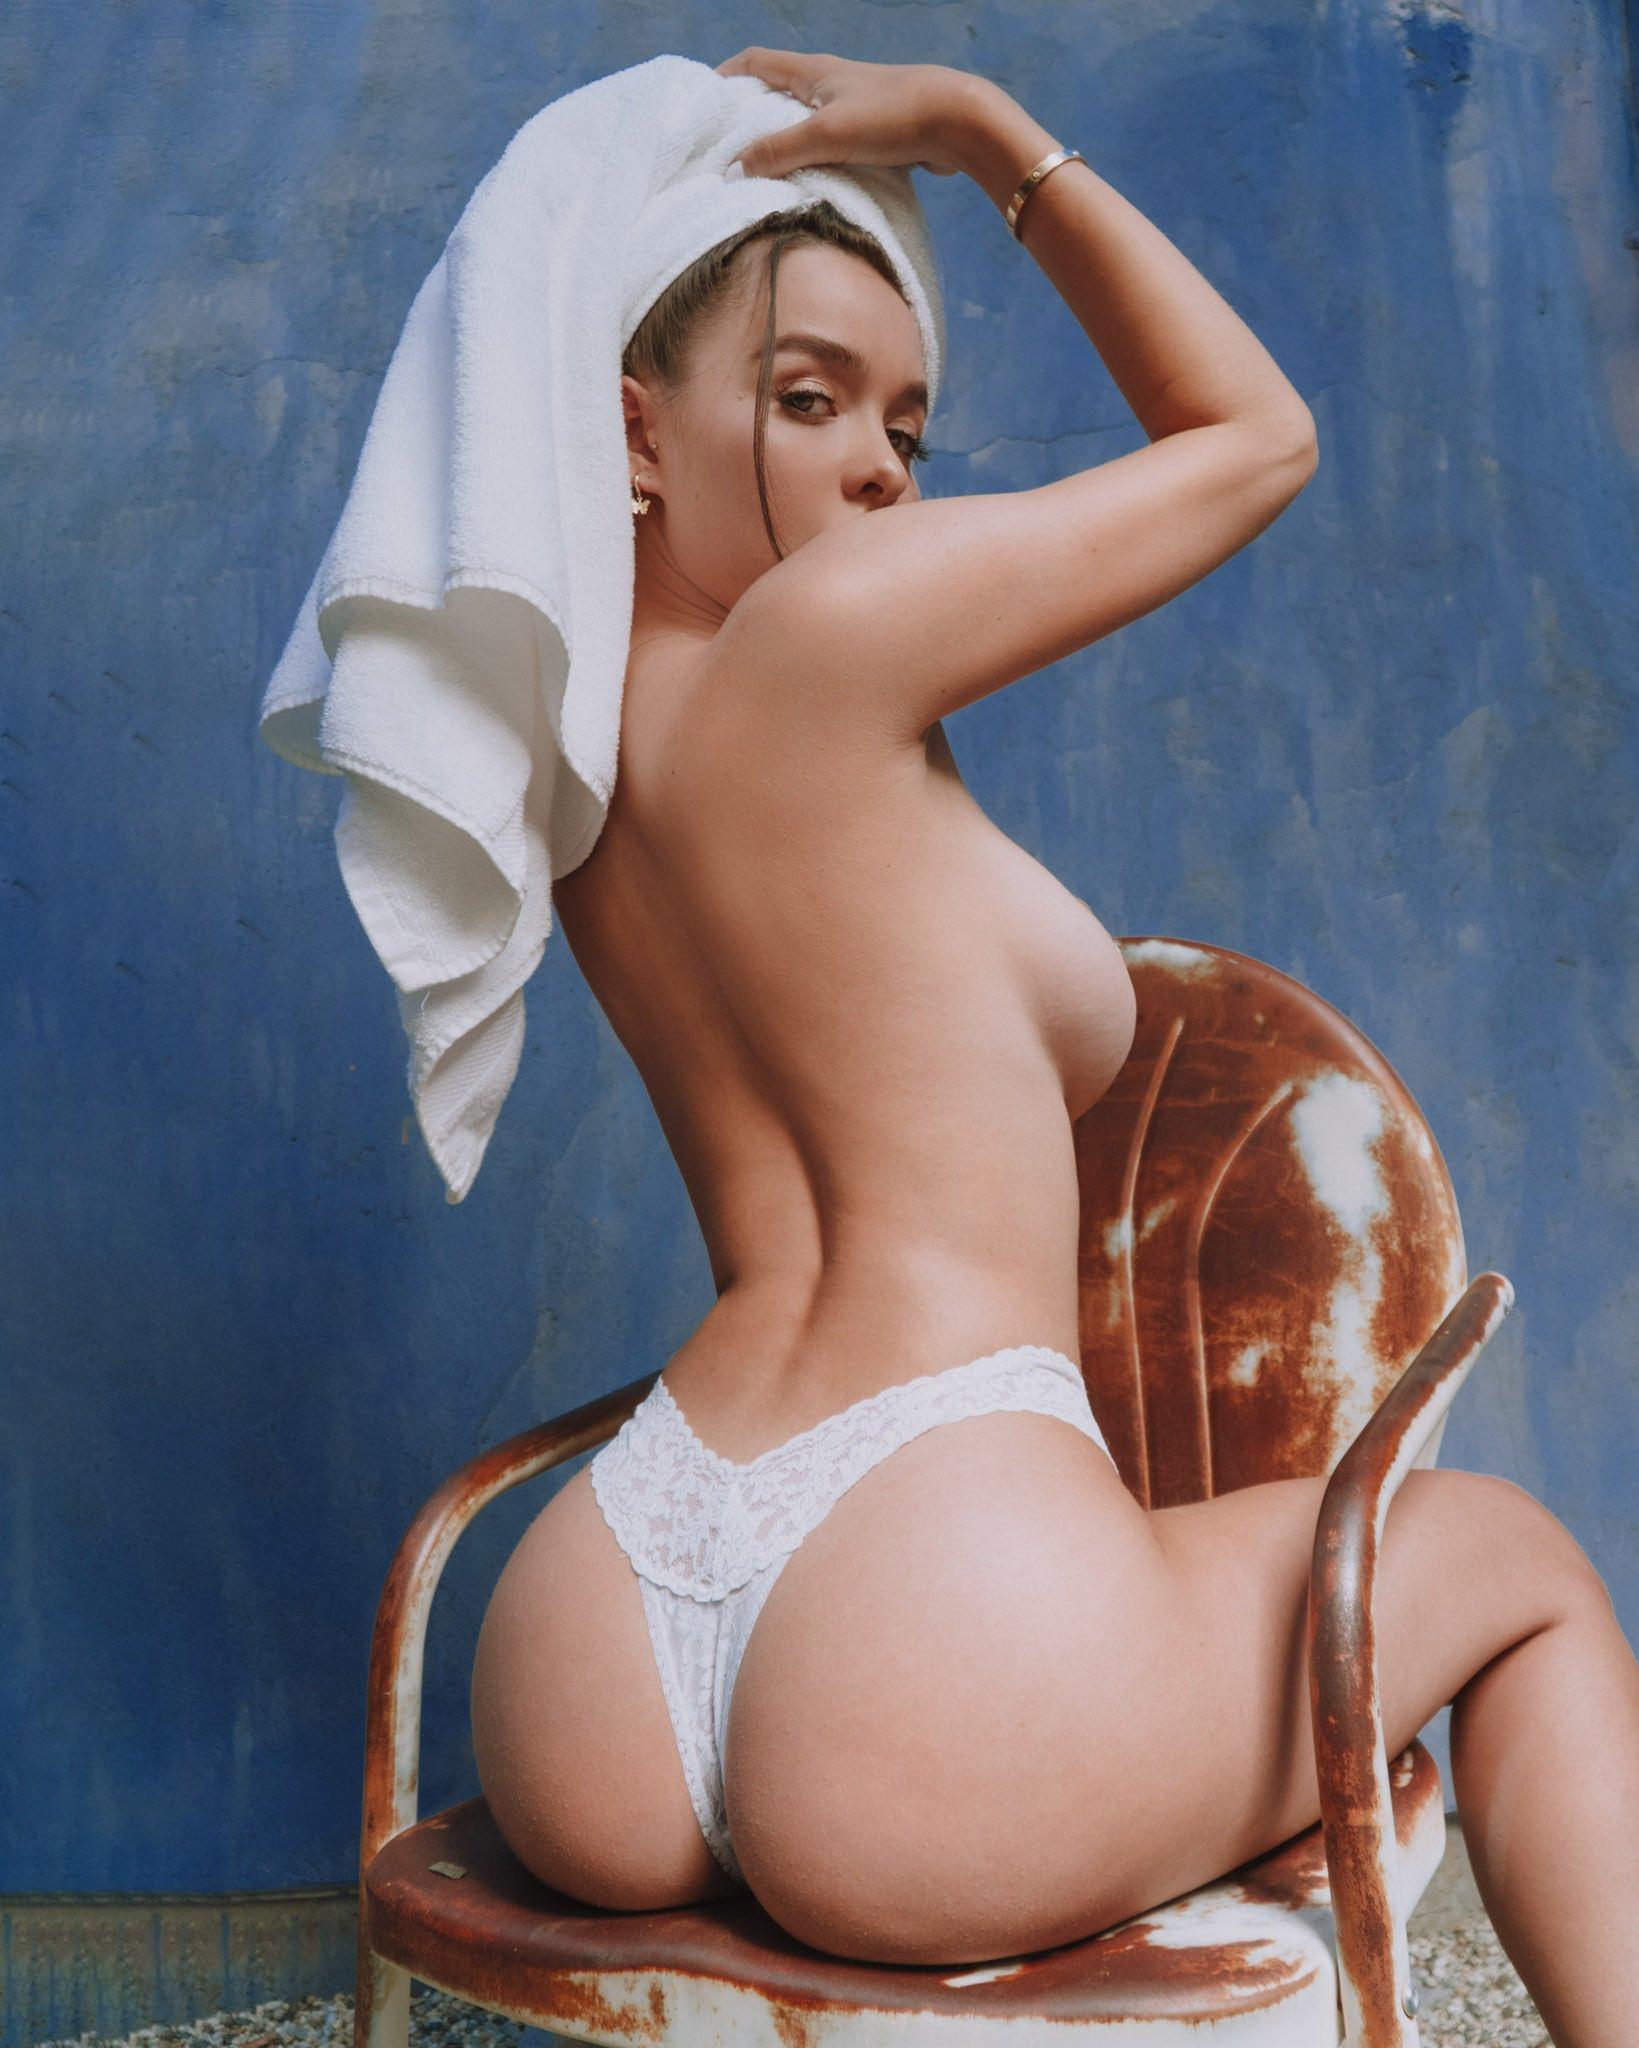 Sophie mudd naked